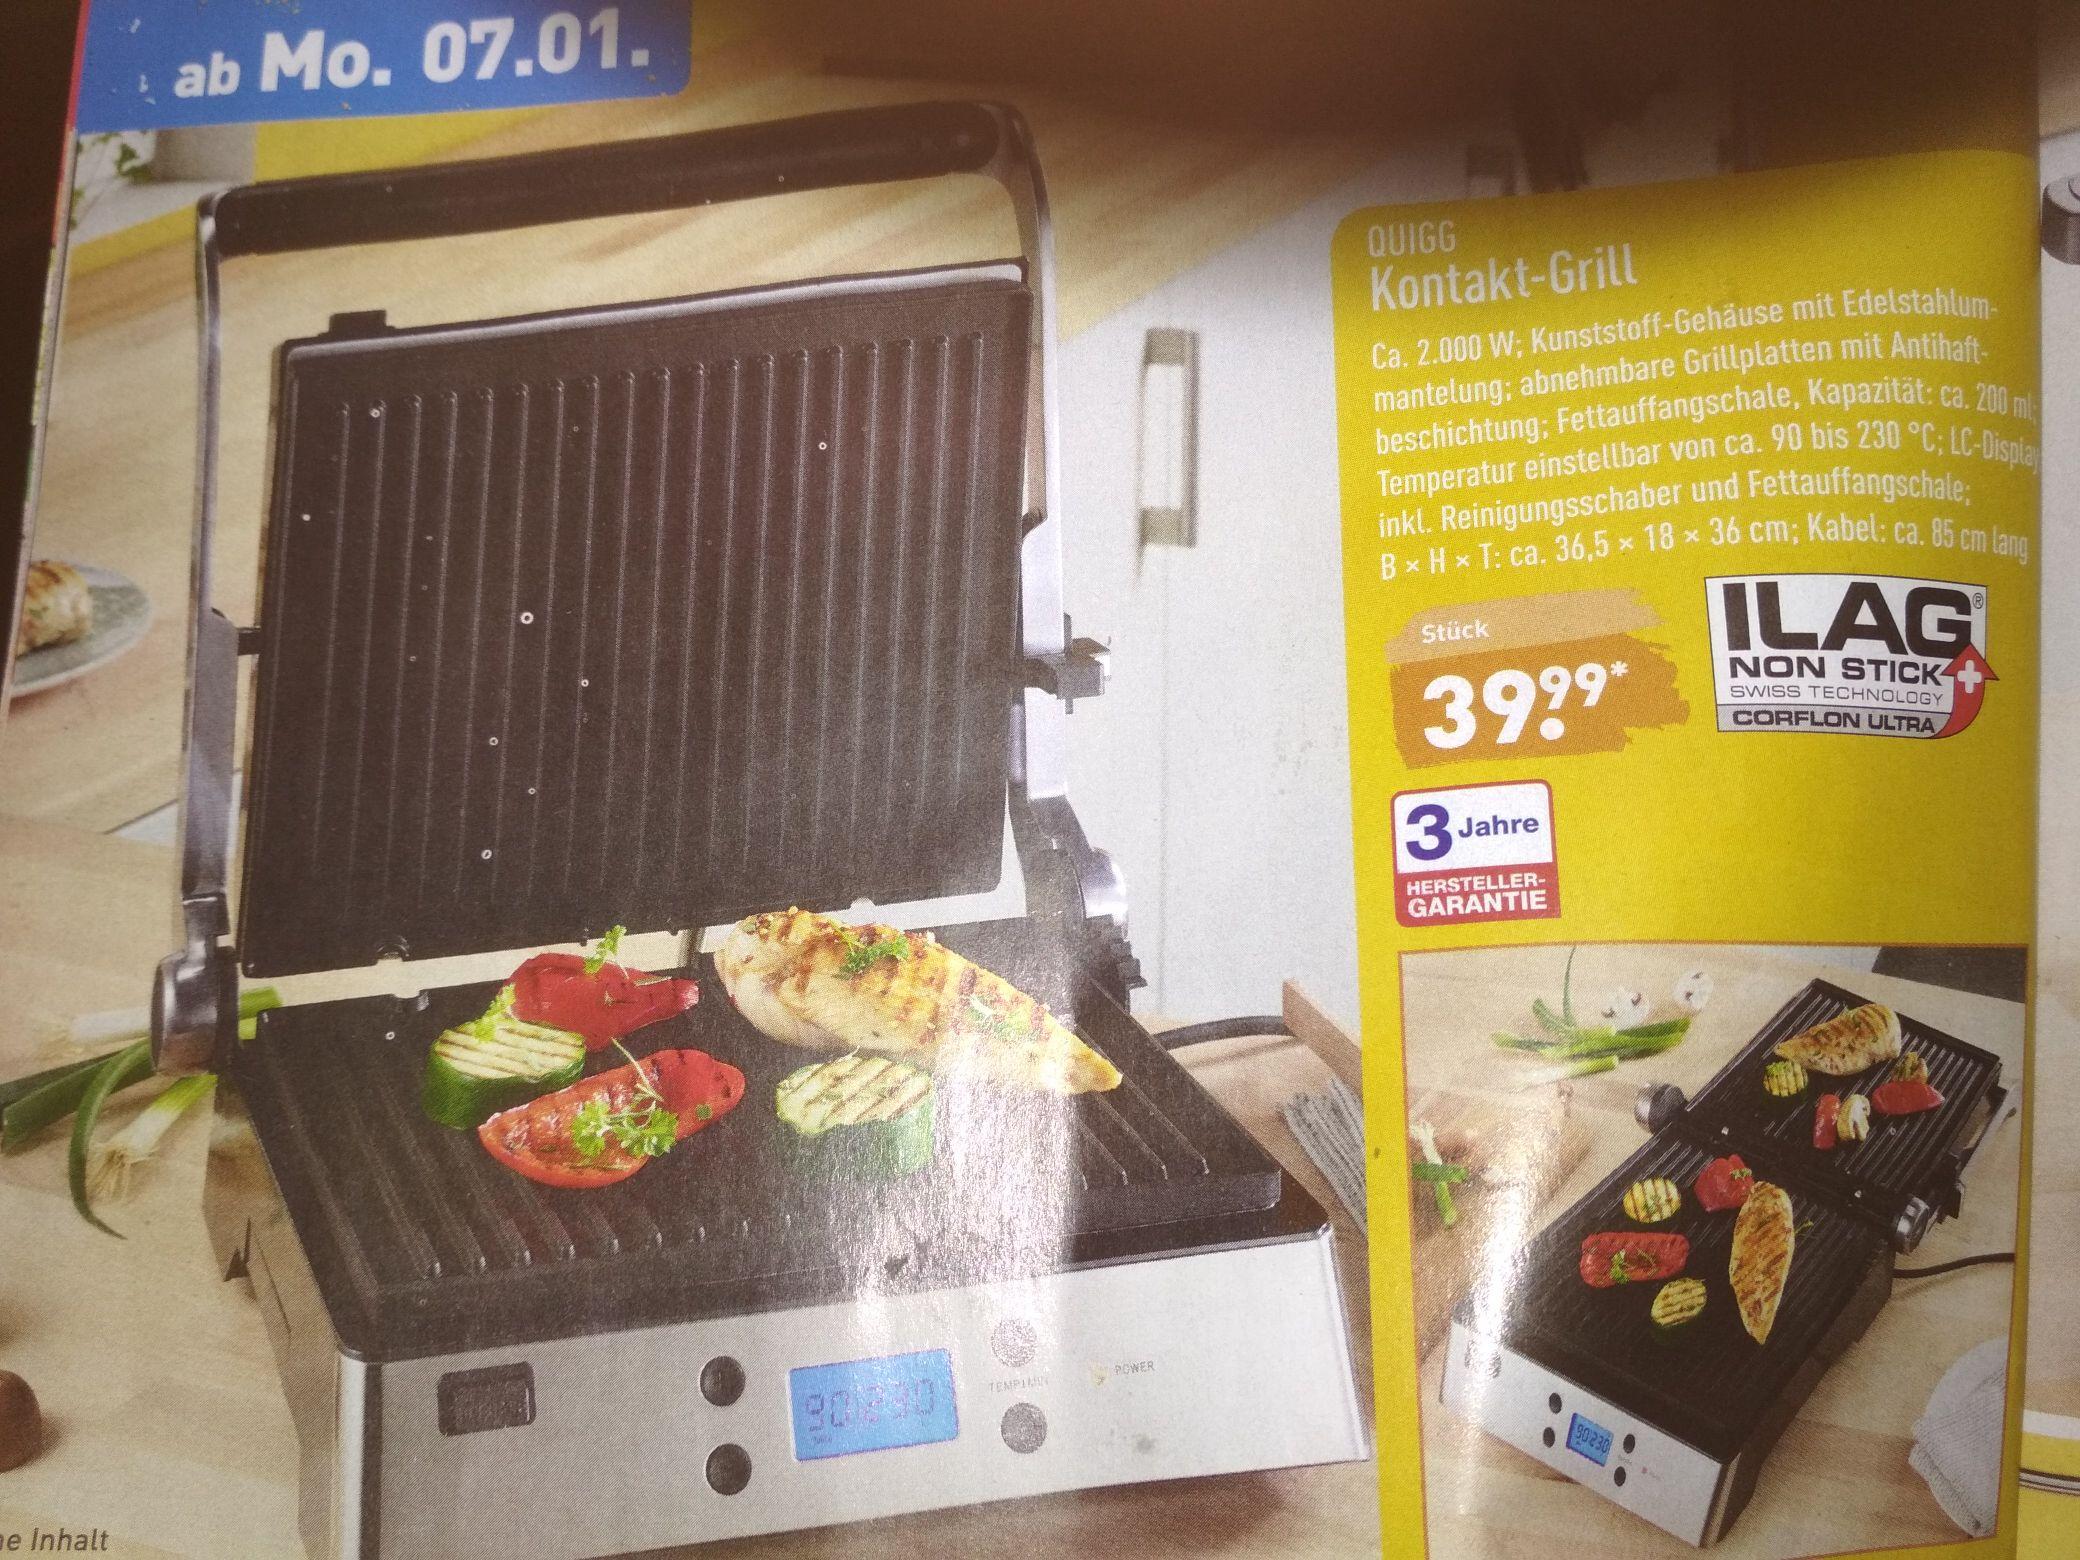 Enders Gasgrill Aldi Nord : Enders grill aldi gasgrill test angebote auf waterige